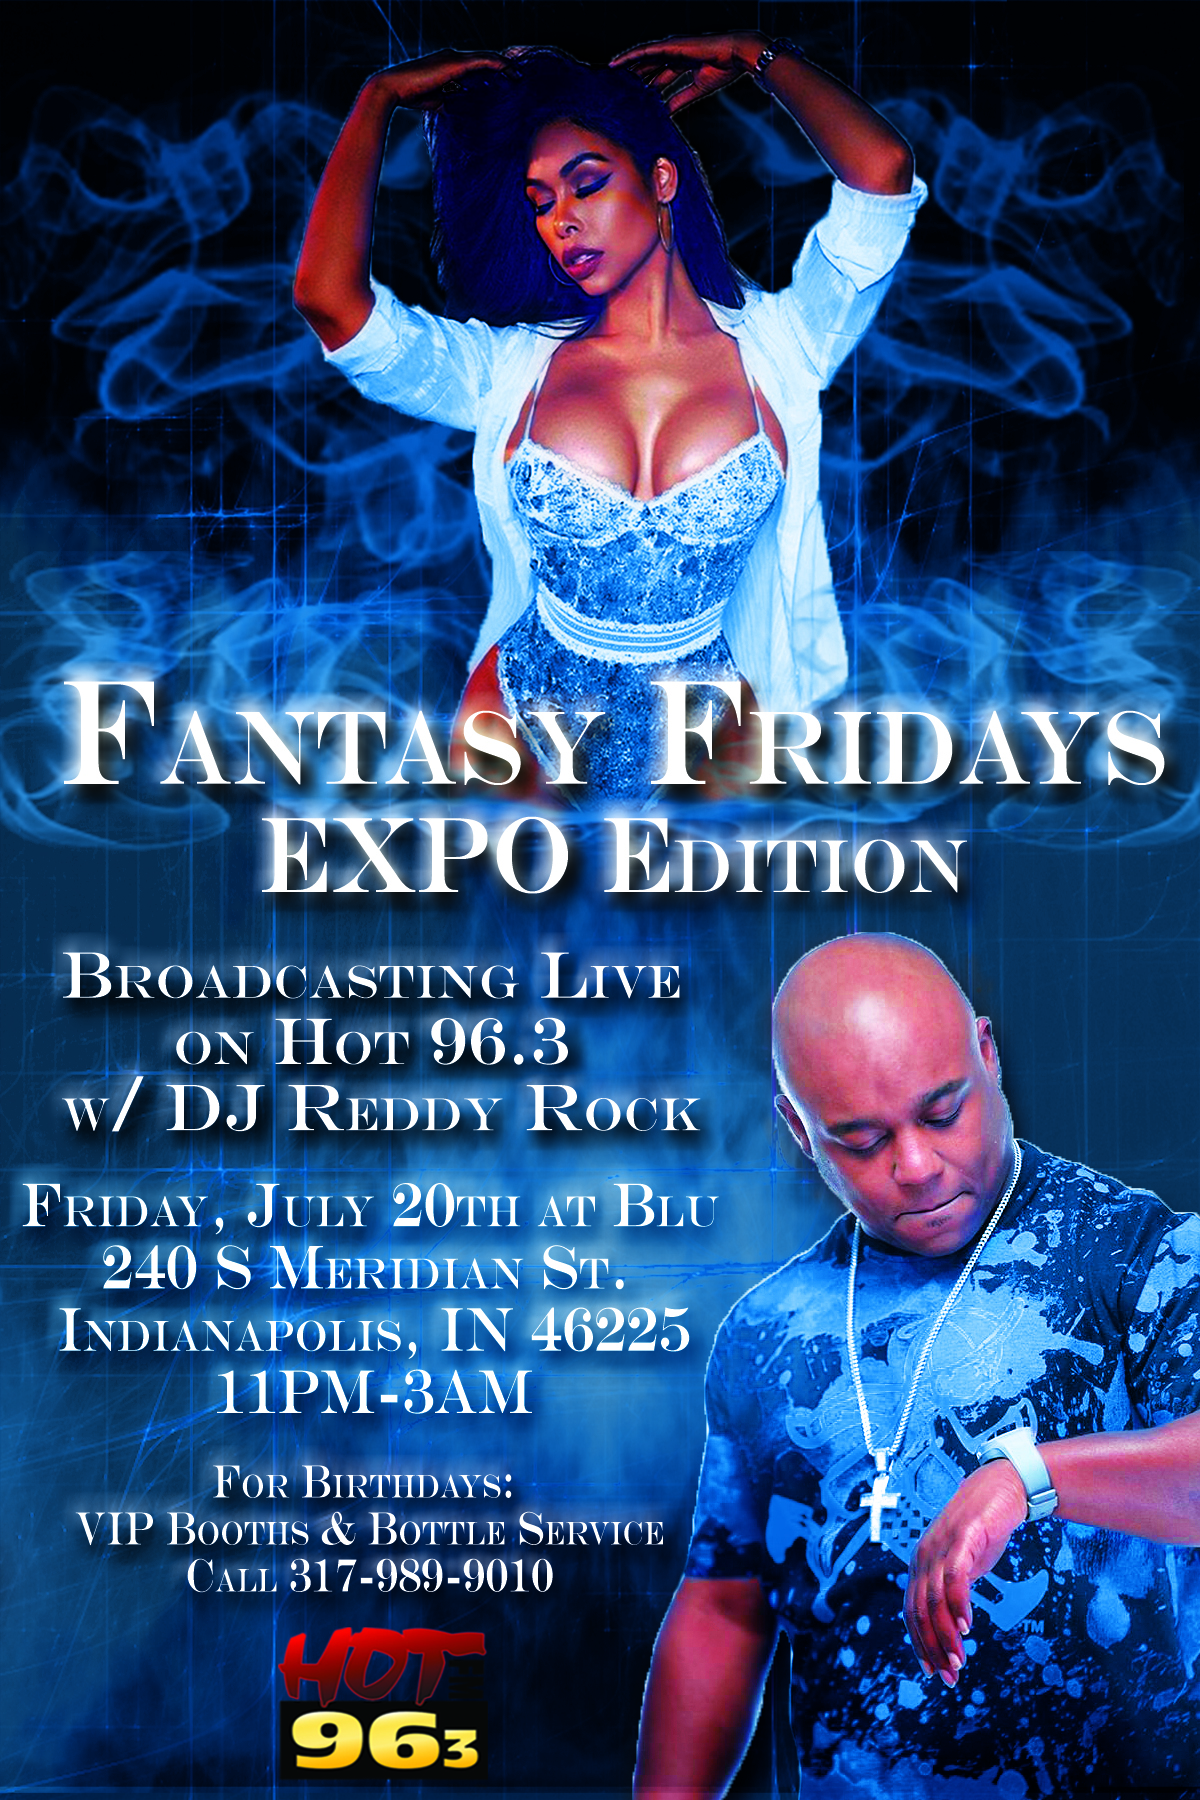 Fantasy Fridays @ Blue (Expo Edition) Flyer